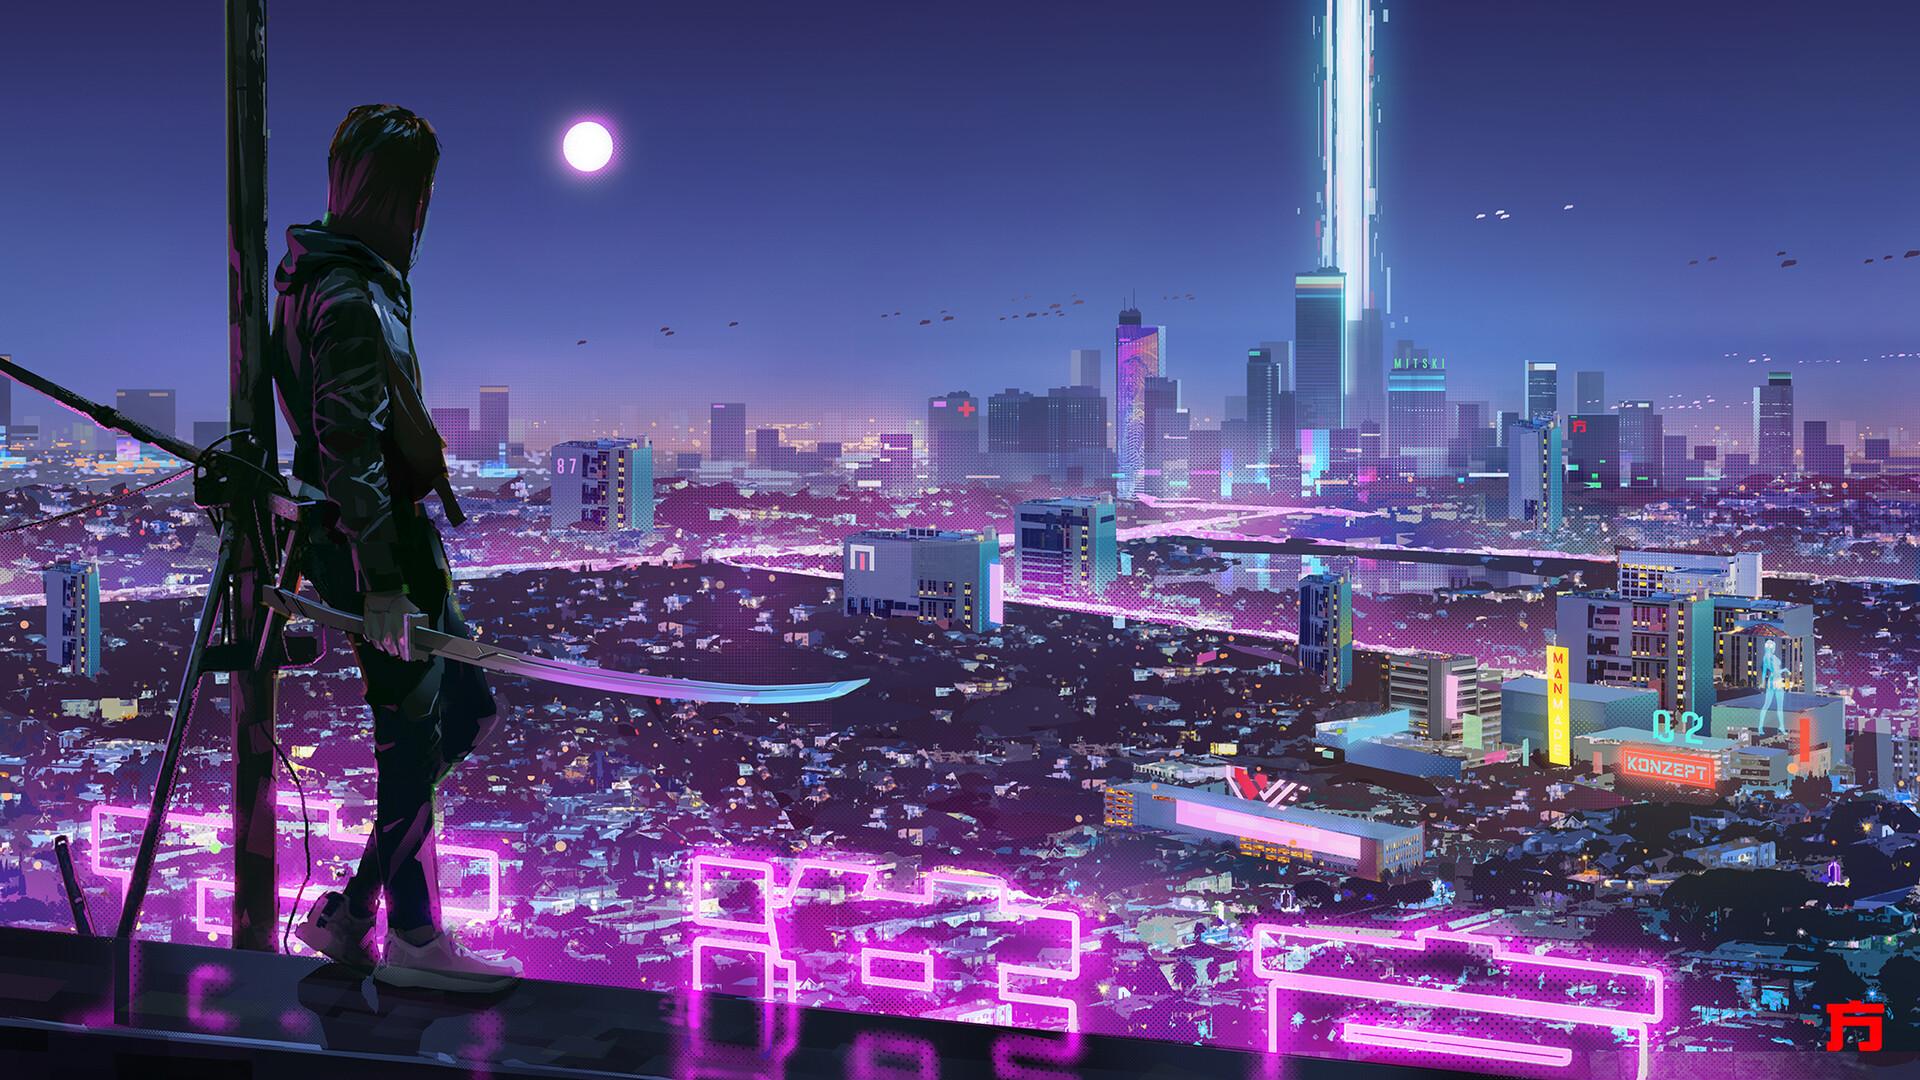 Warrior Girl in Cyberpunk City Wallpaper, HD Artist 4K ...